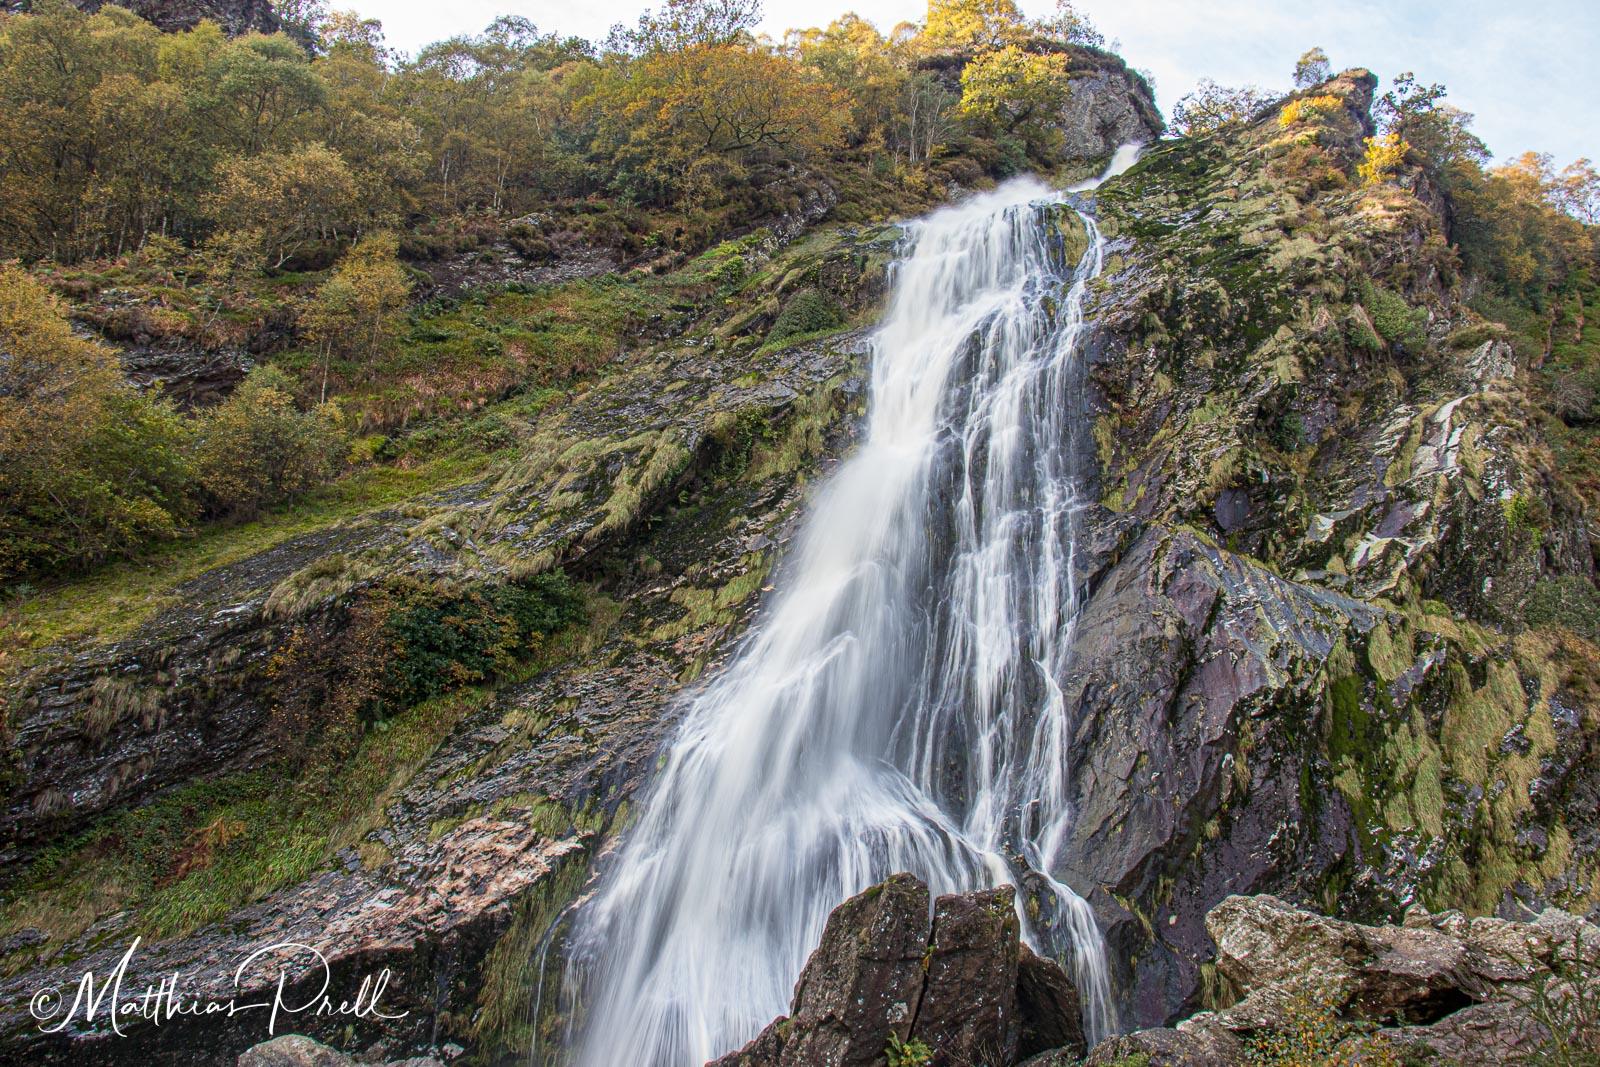 Powerscourt Wasserfall, Ireland